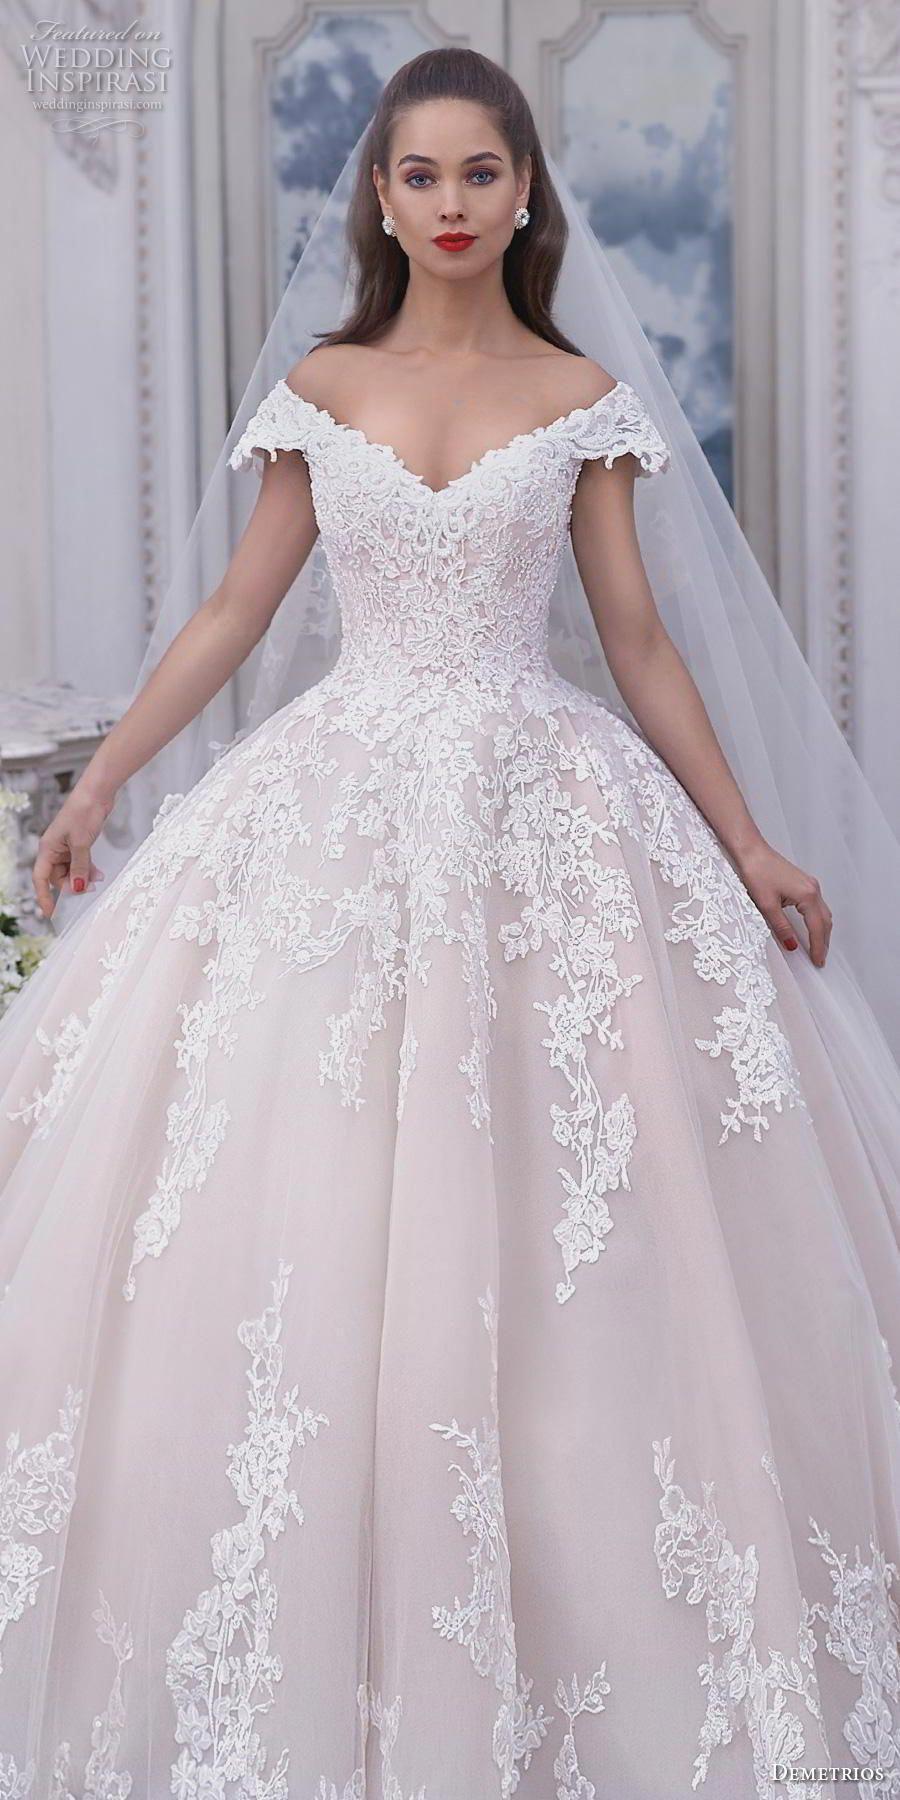 0ee1f908fa7 demetrios 2019 bridal cap sleeves off the shoulder v neck heavily  embellished bodice hem blush princess ball gown a line wedding dress chapel  train (2) lv ...